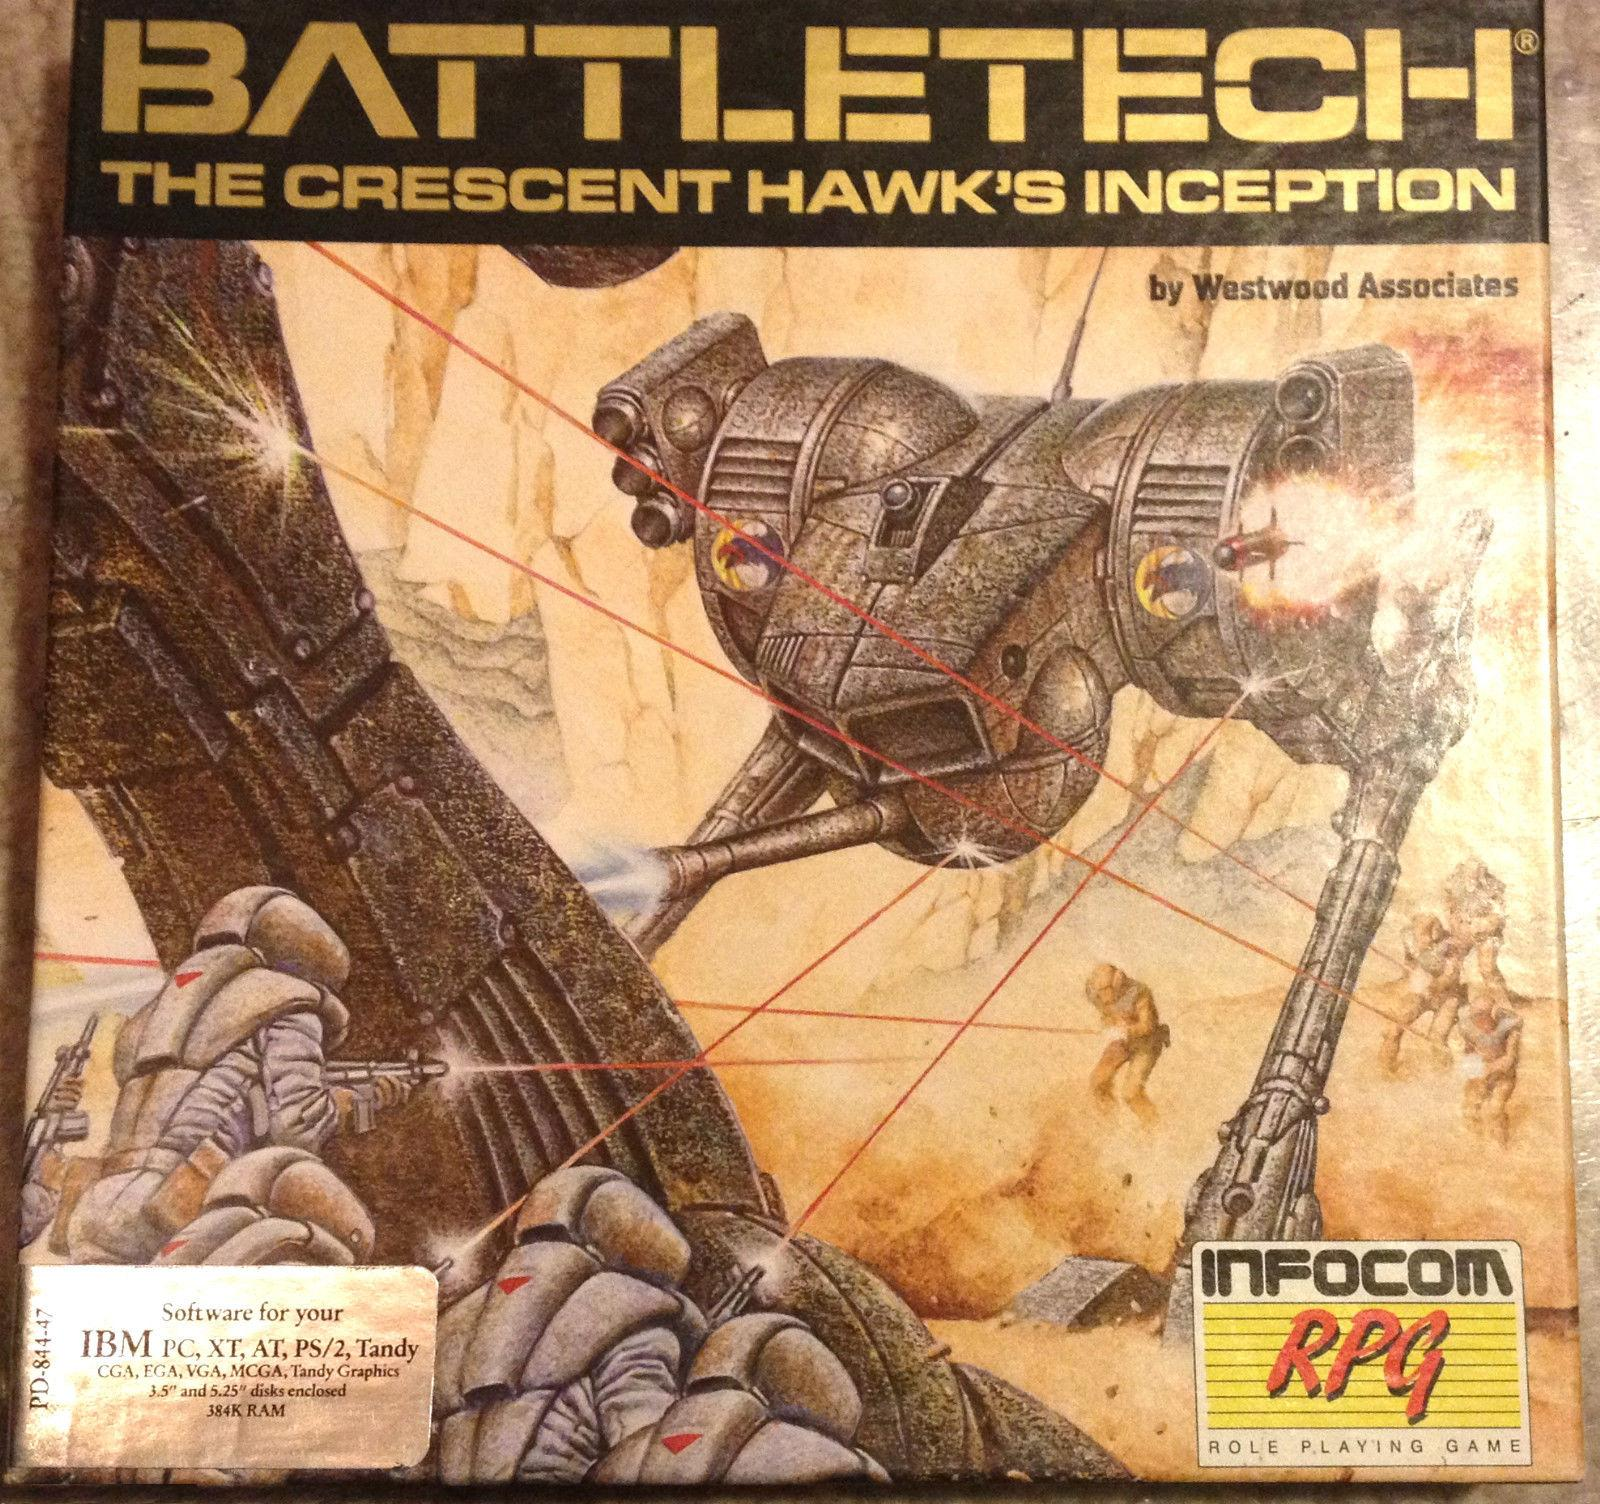 Download BattleTech: The Crescent Hawks inception